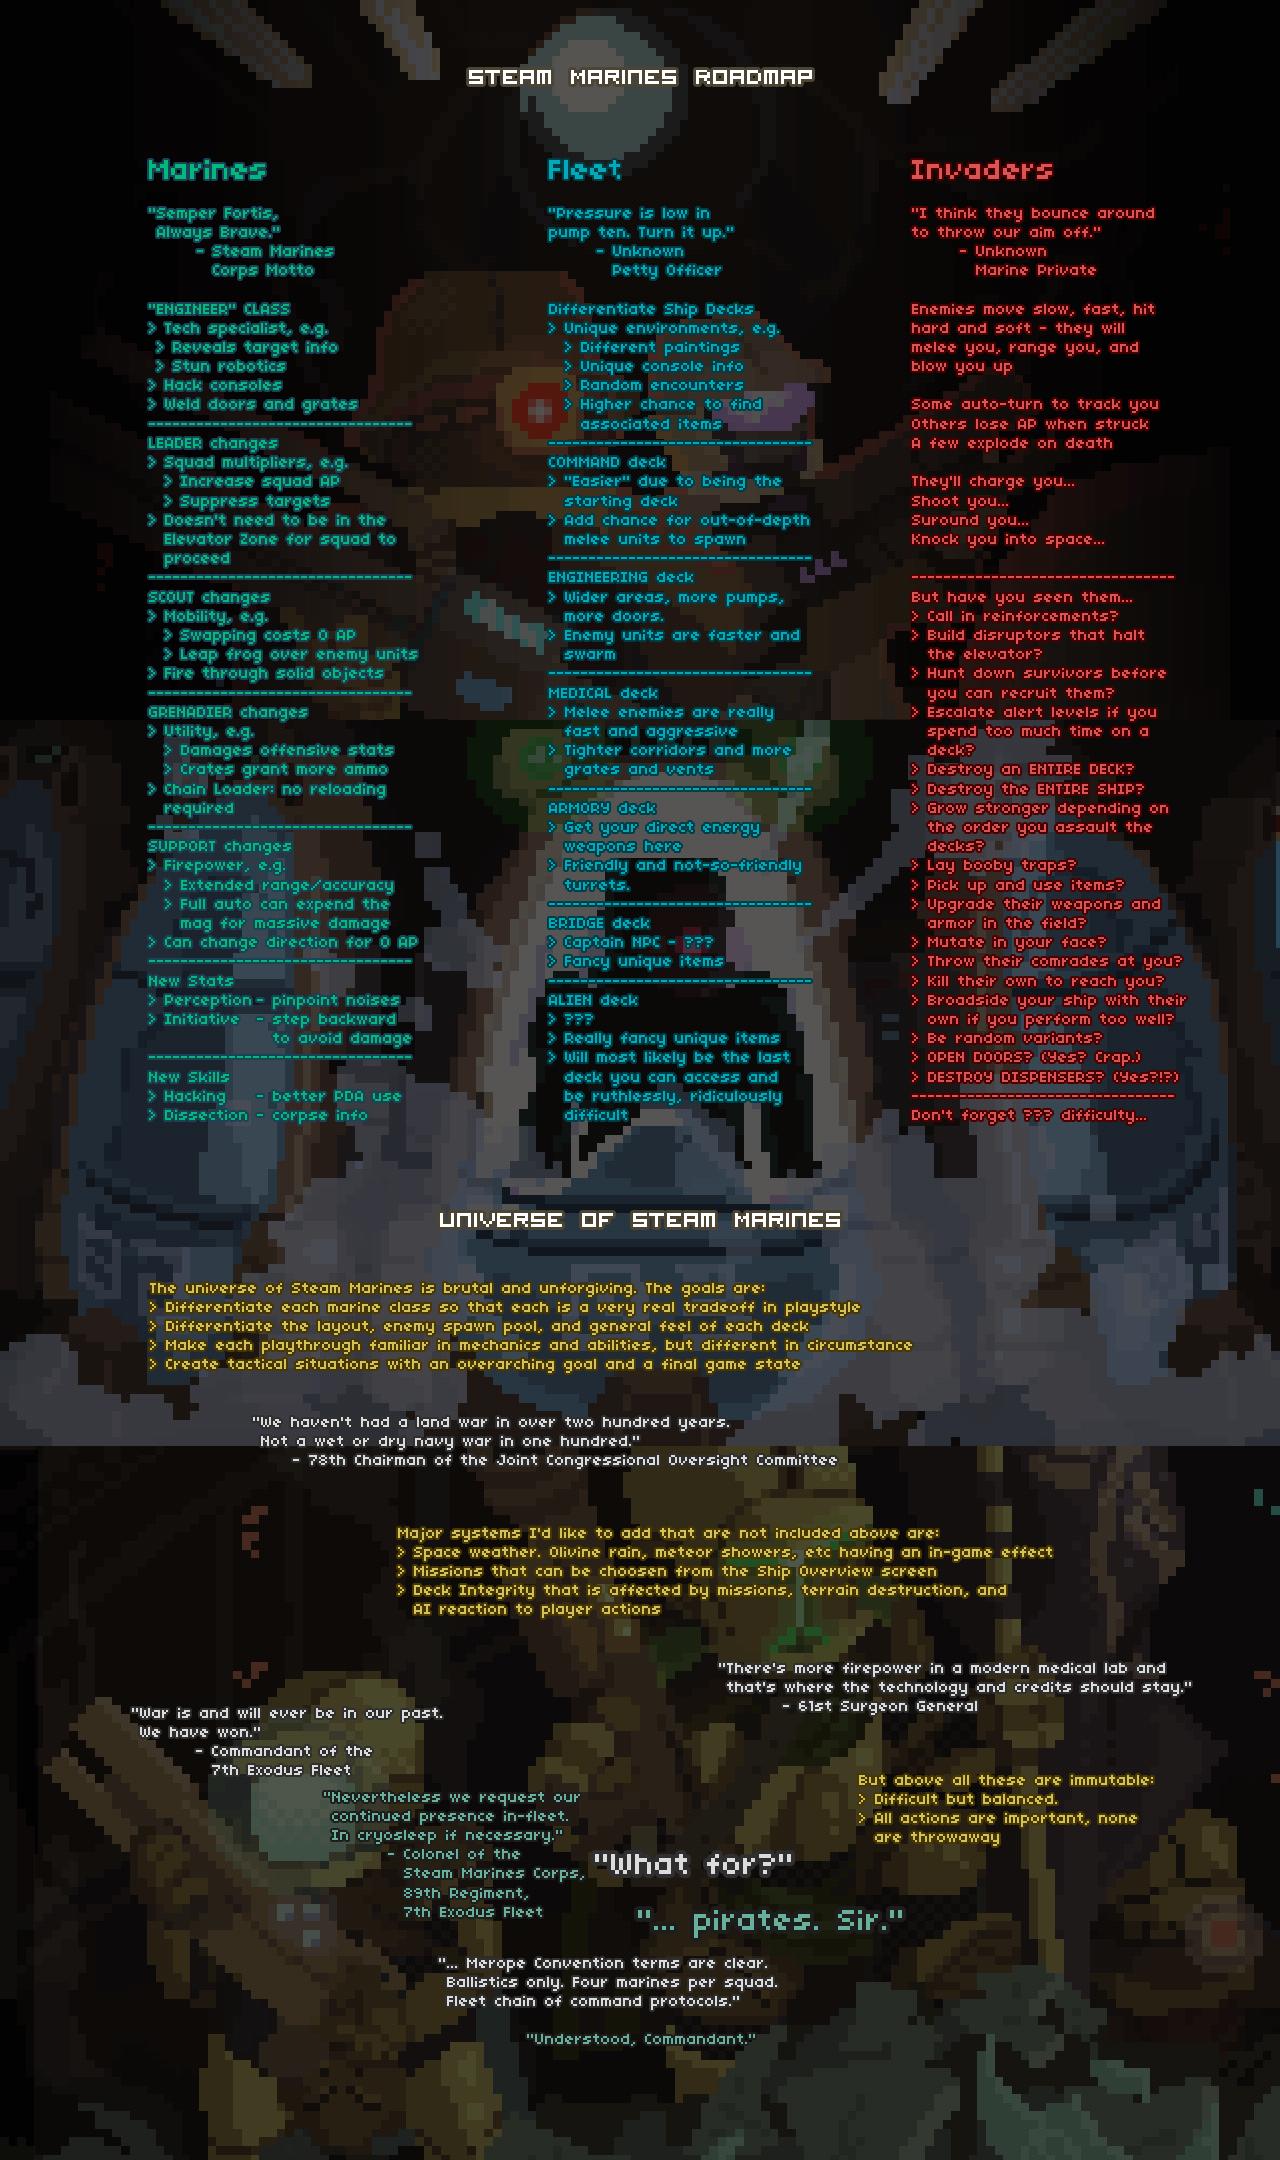 Steam Marines Roadmap